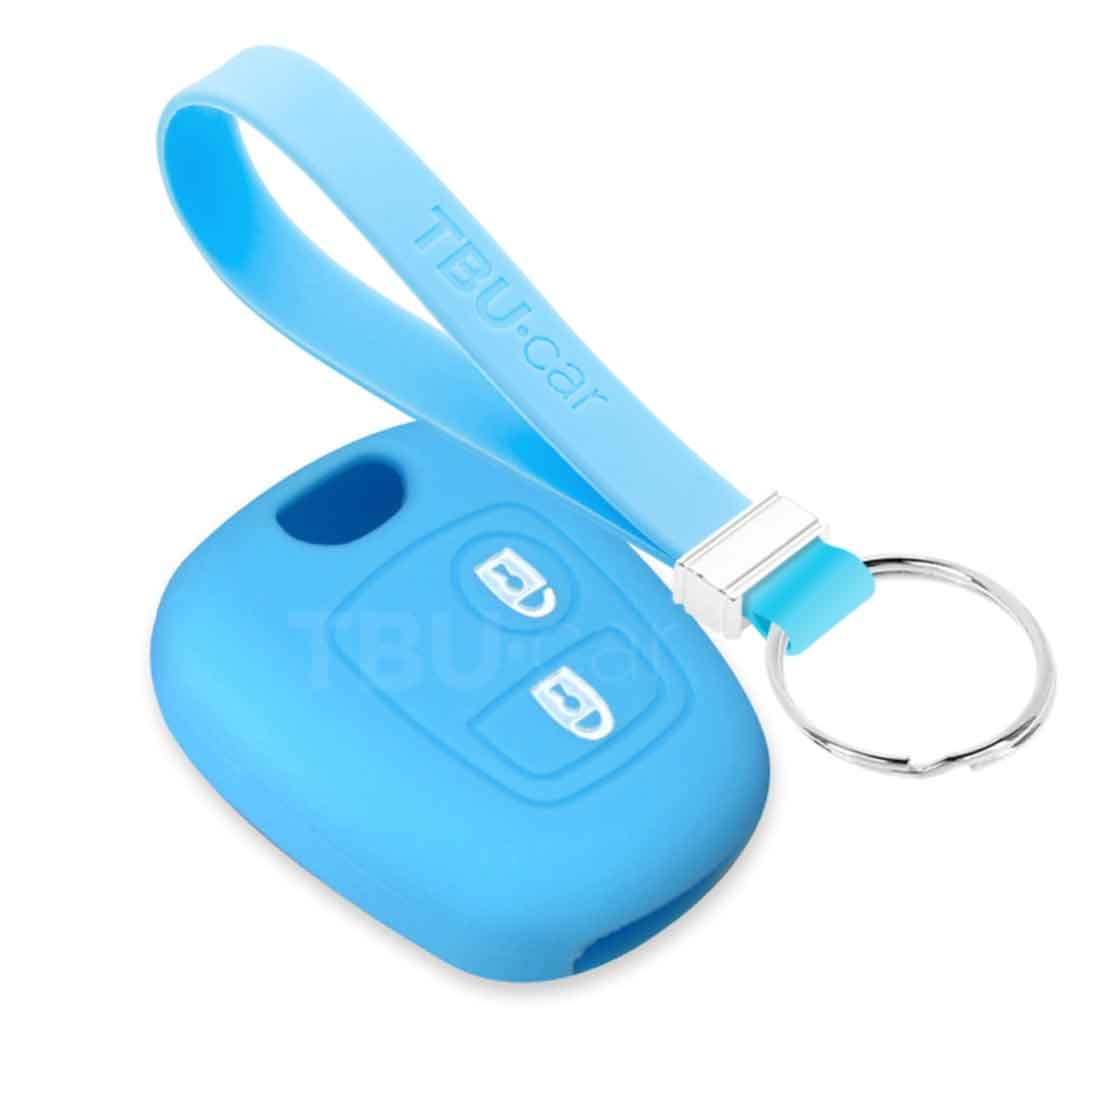 TBU car TBU car Autoschlüssel Hülle kompatibel mit Toyota 2 Tasten - Schutzhülle aus Silikon - Auto Schlüsselhülle Cover in Hellblau